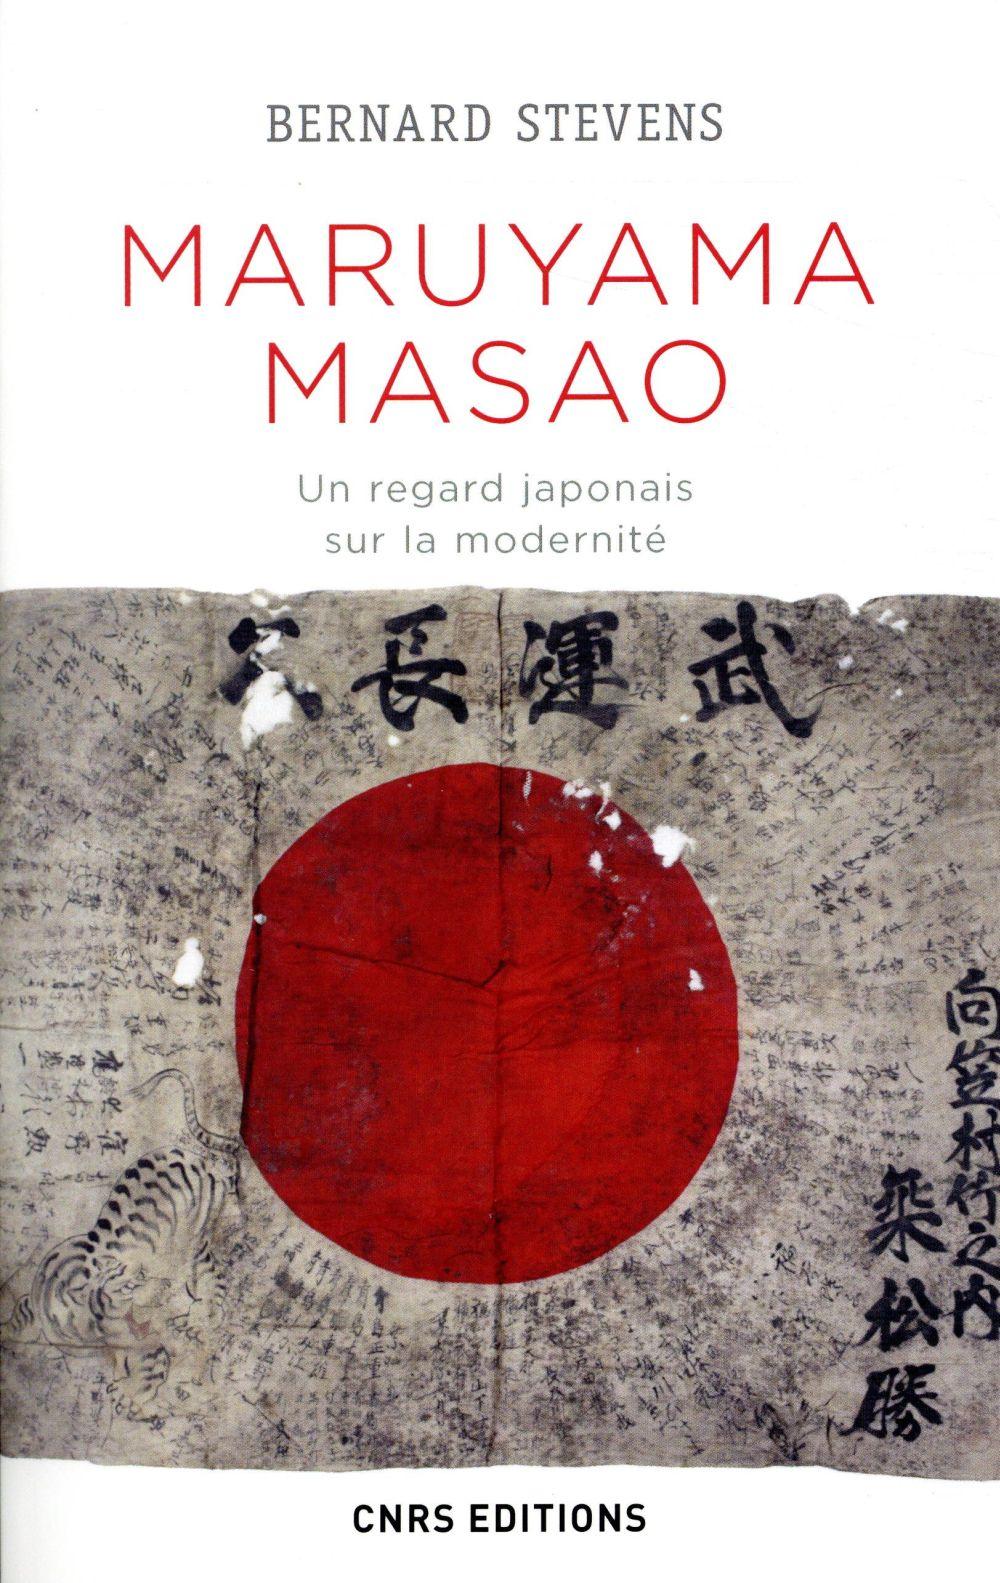 MARUYAMA MASAO : UN REGARD JAPONAIS SUR LA MODERNITE